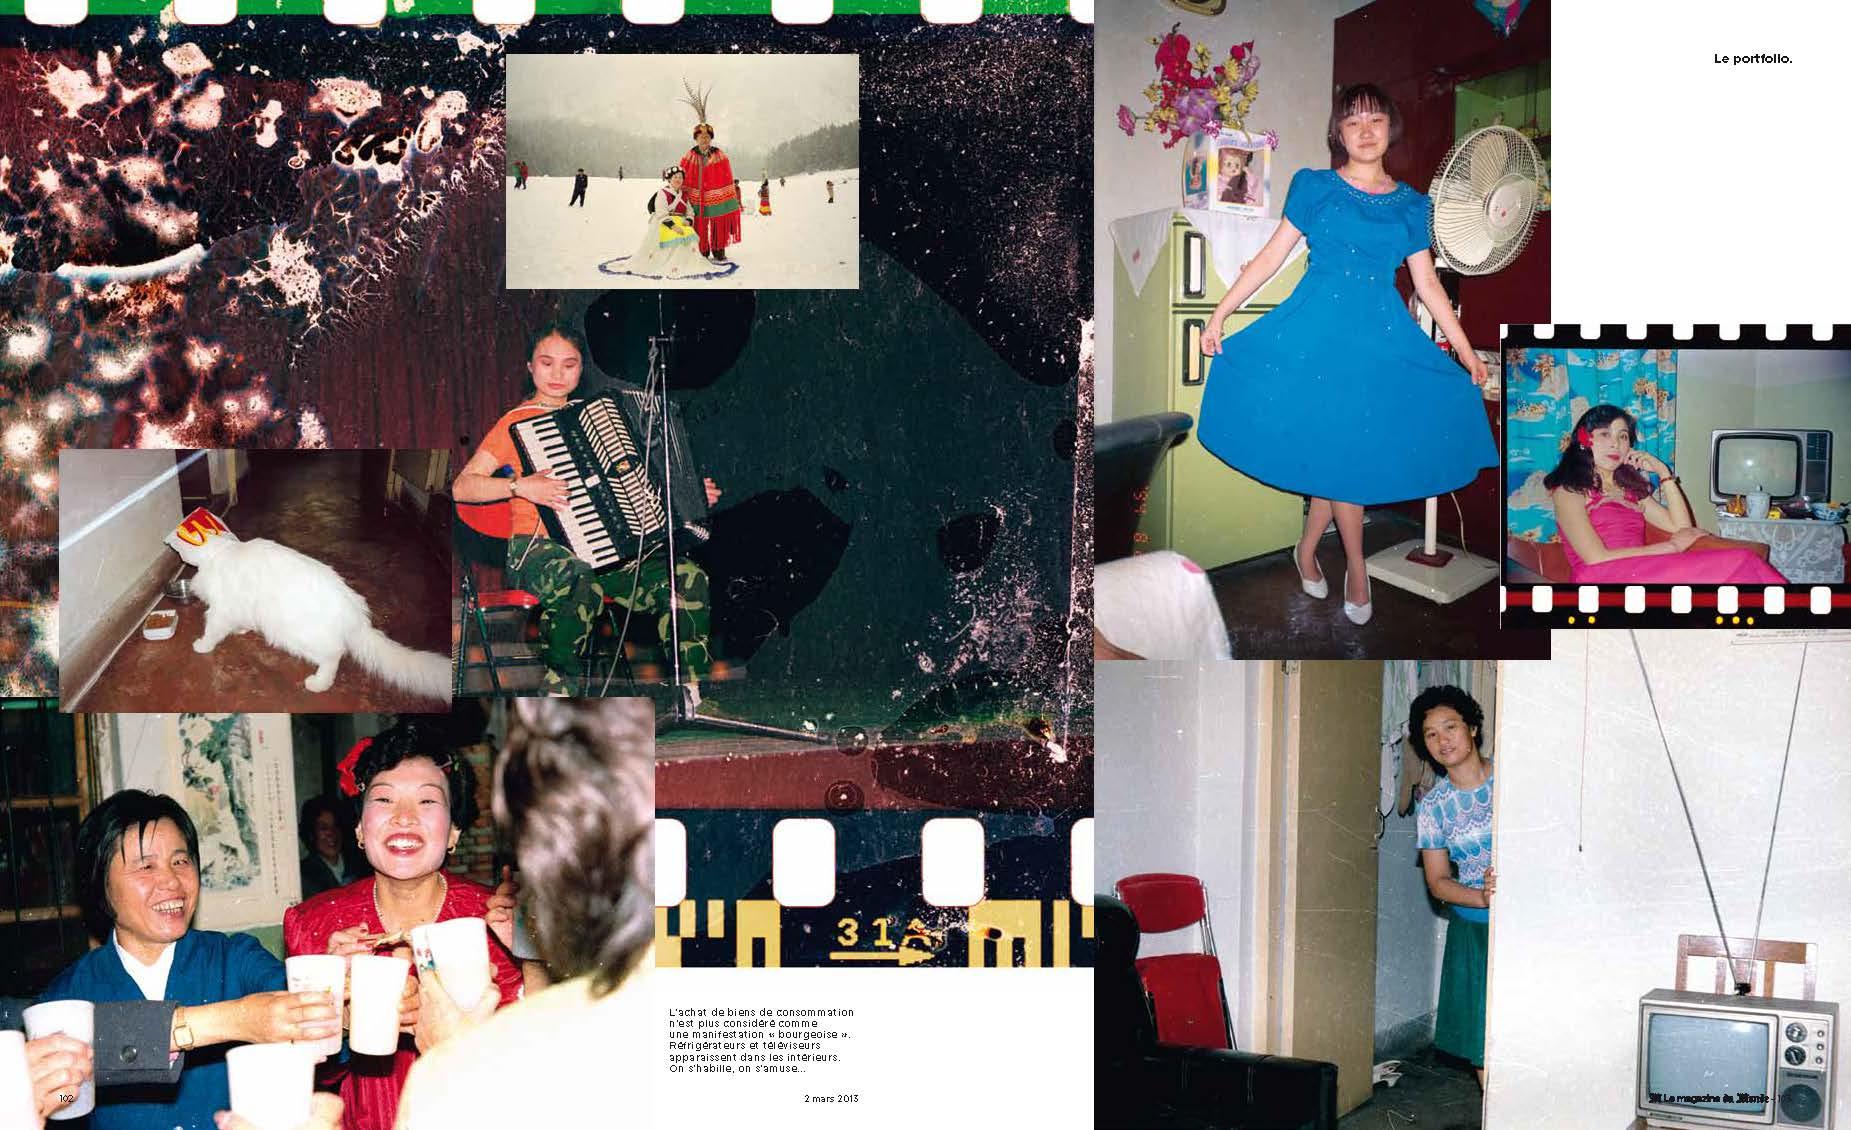 M le Magazine - 20130302 - Silvermine_Page_5.jpg